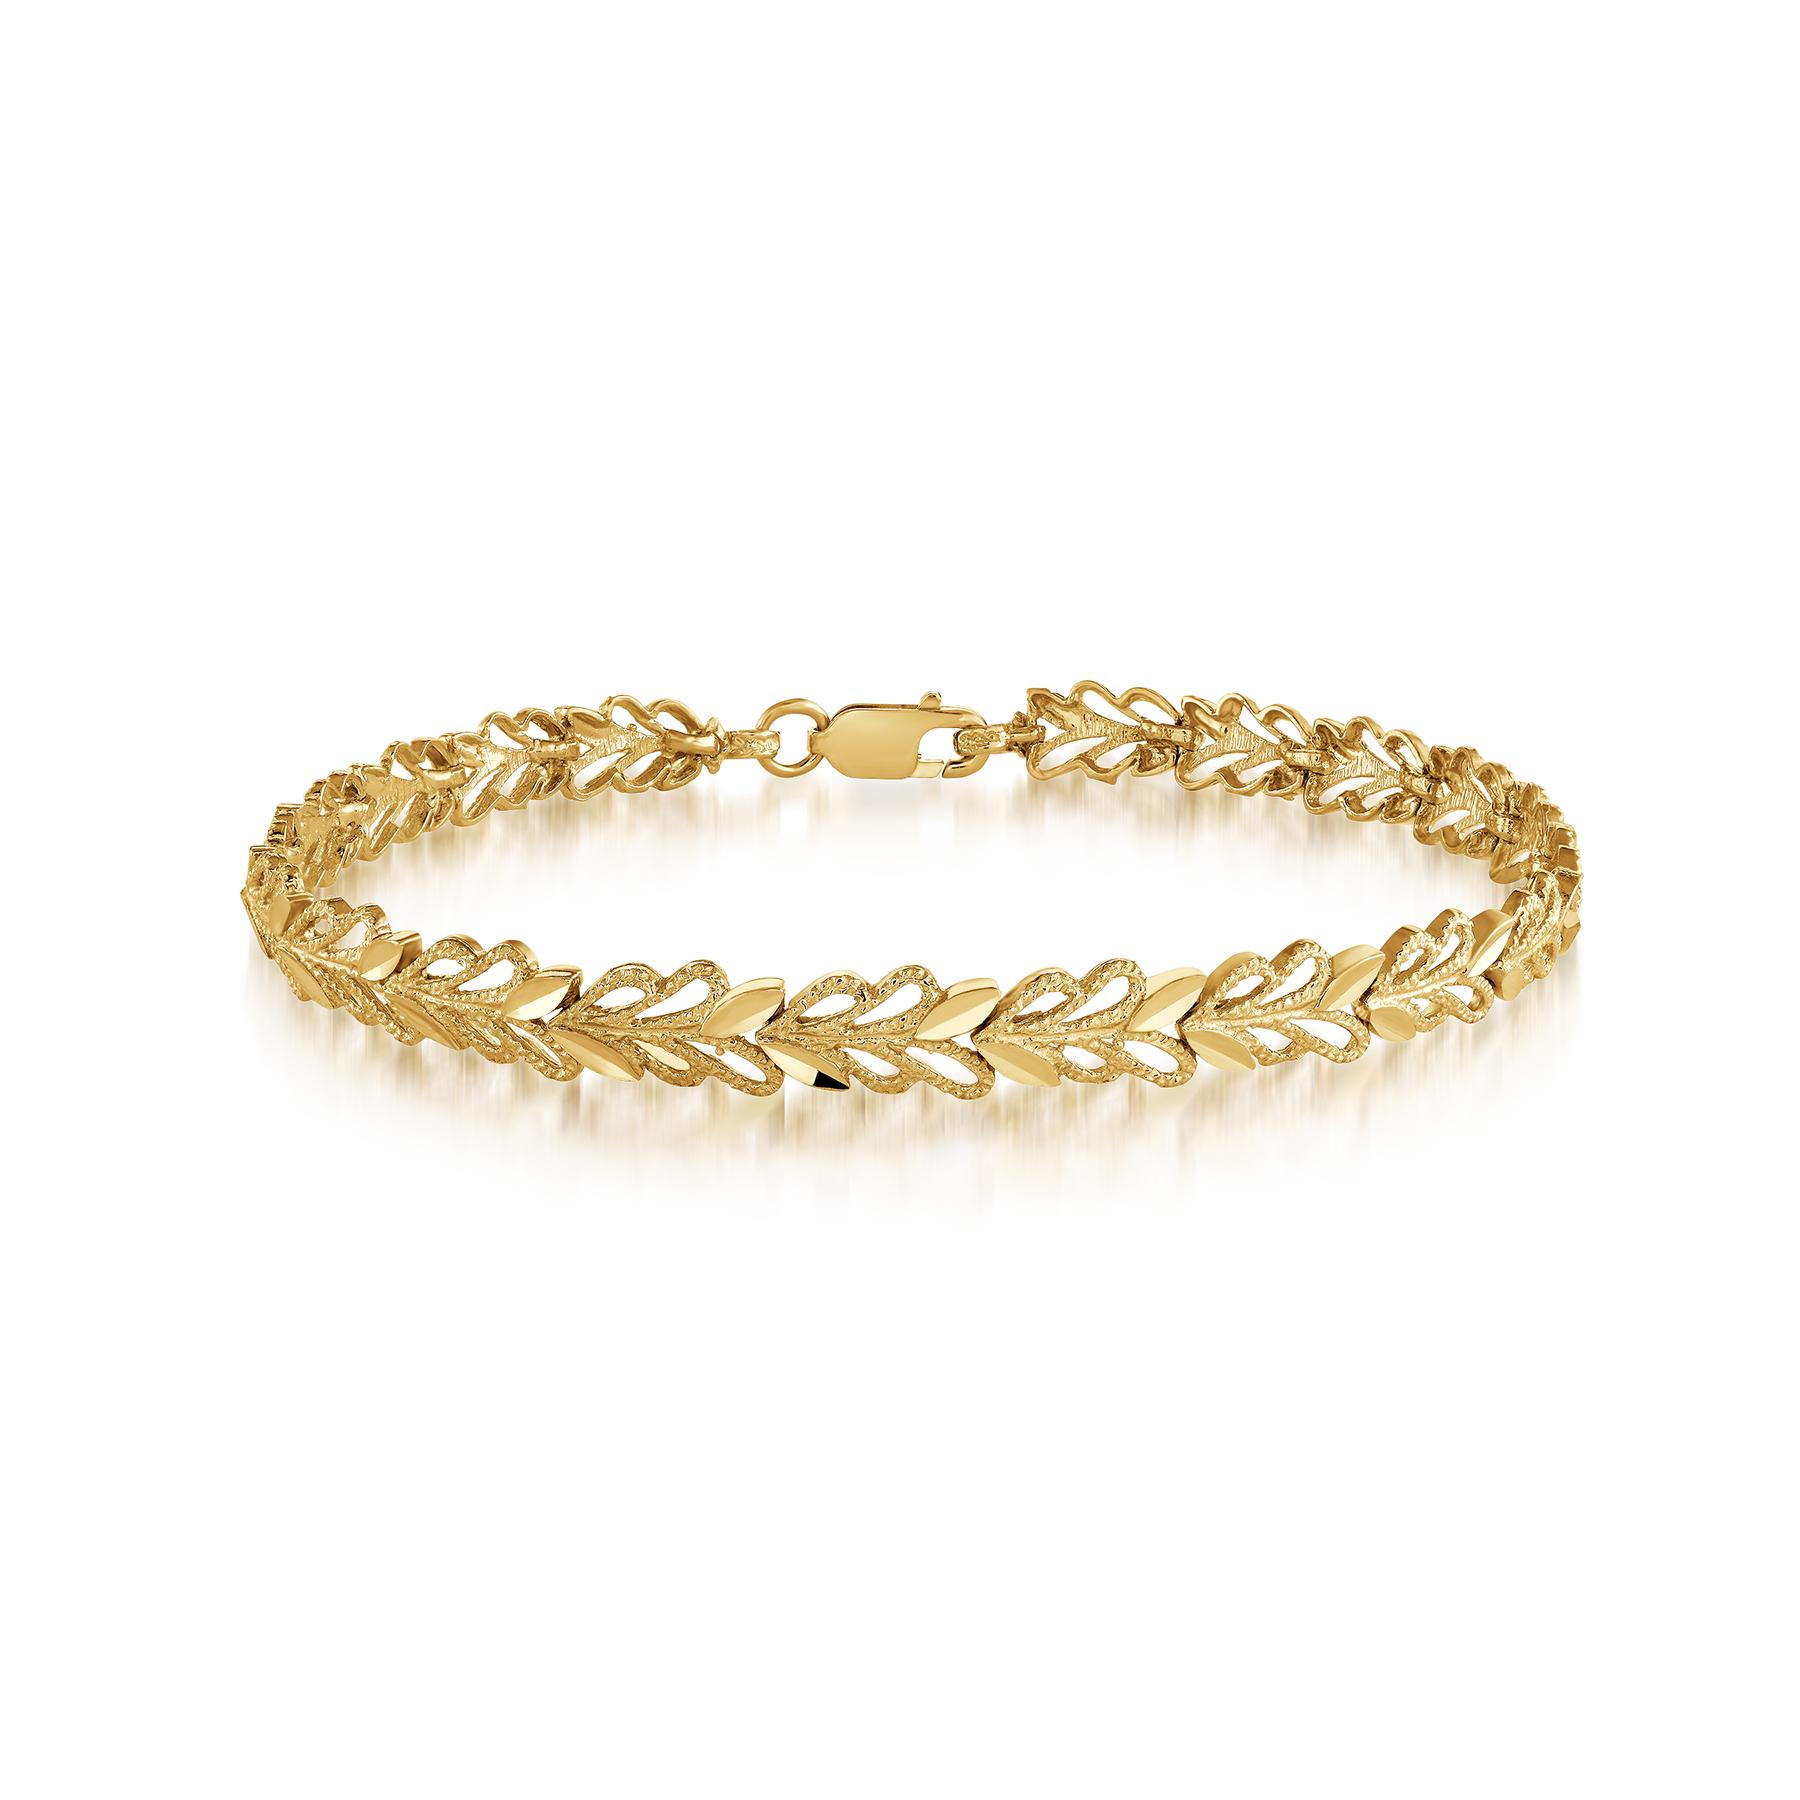 Bracelet pour femme - Or jaune 10K